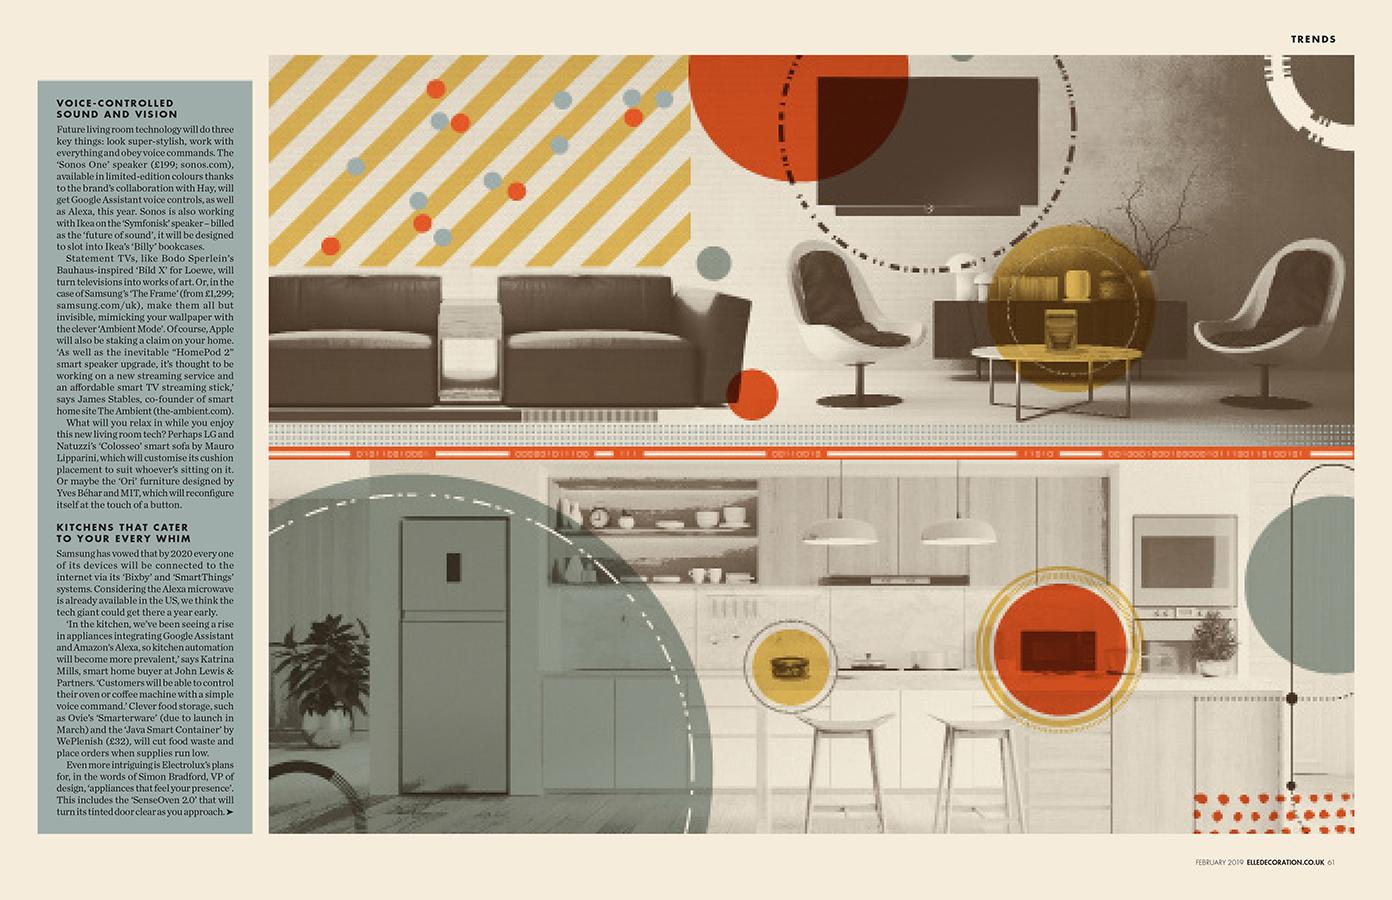 Smarter-Homes4-2.png